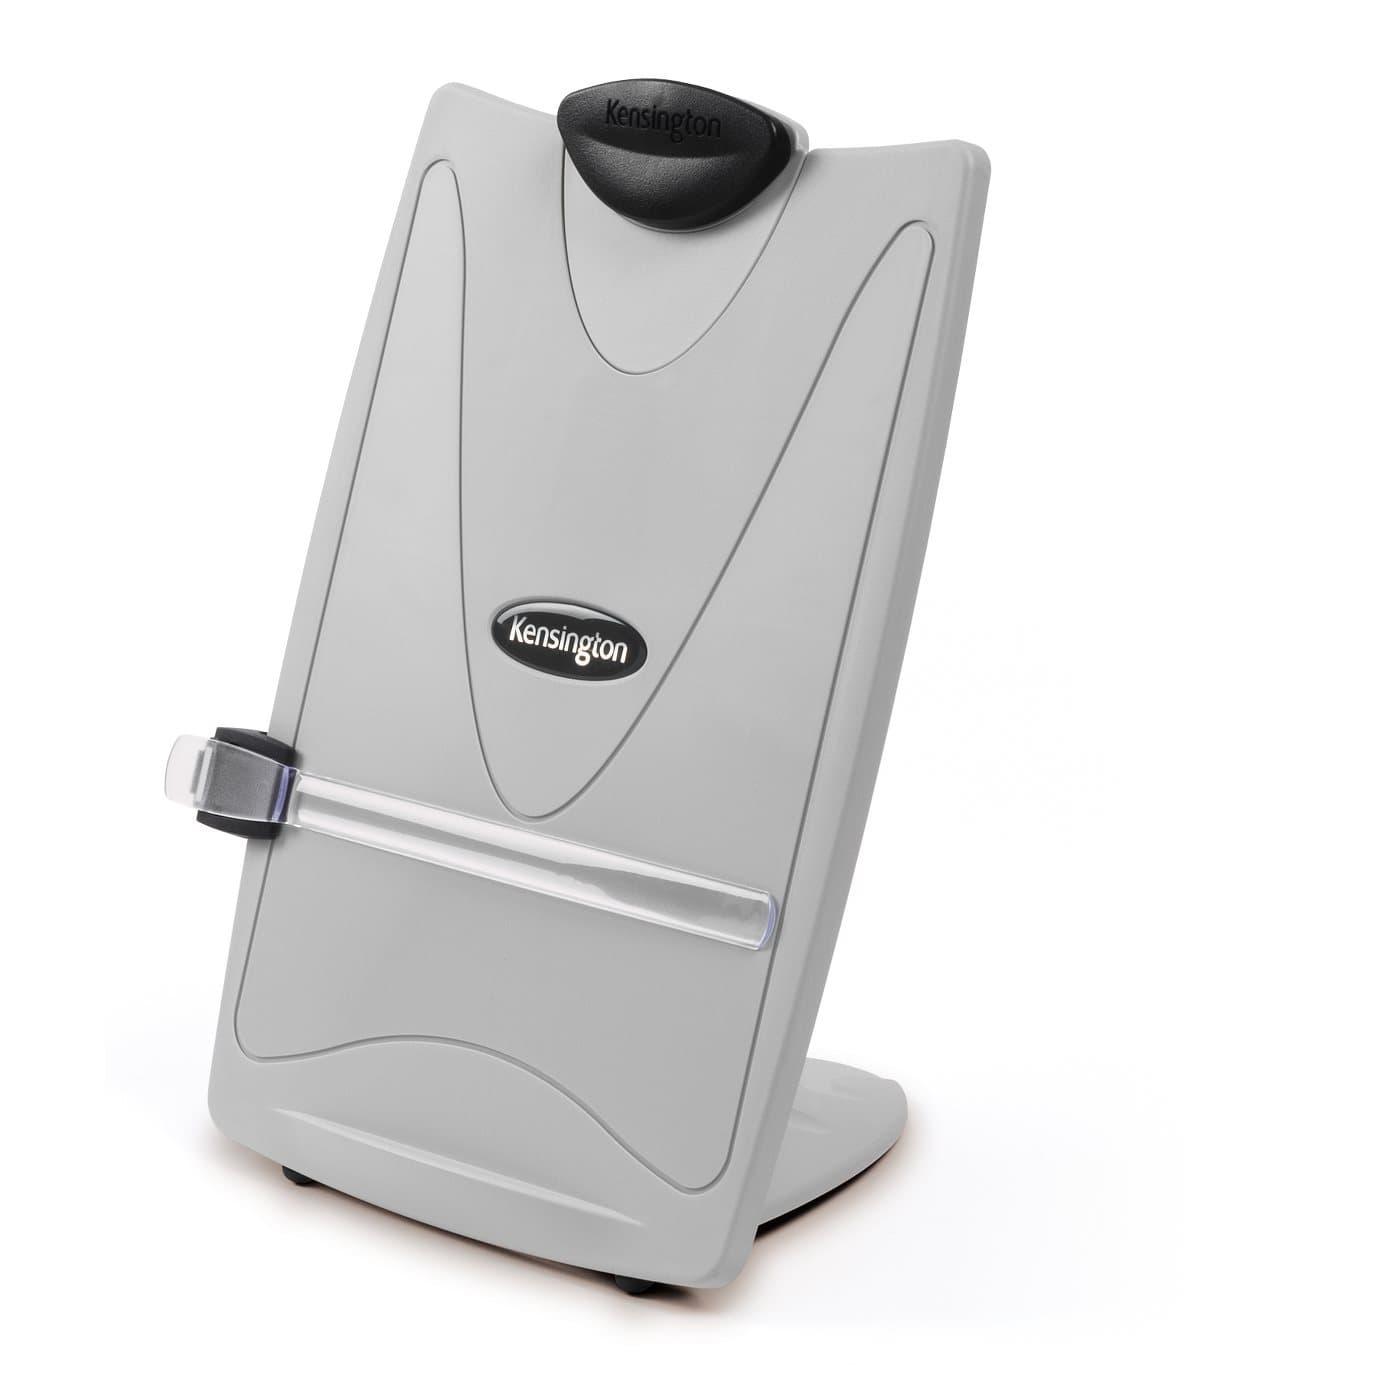 Kensington Rexel Kensington InSight® Plus-Konzepthalter